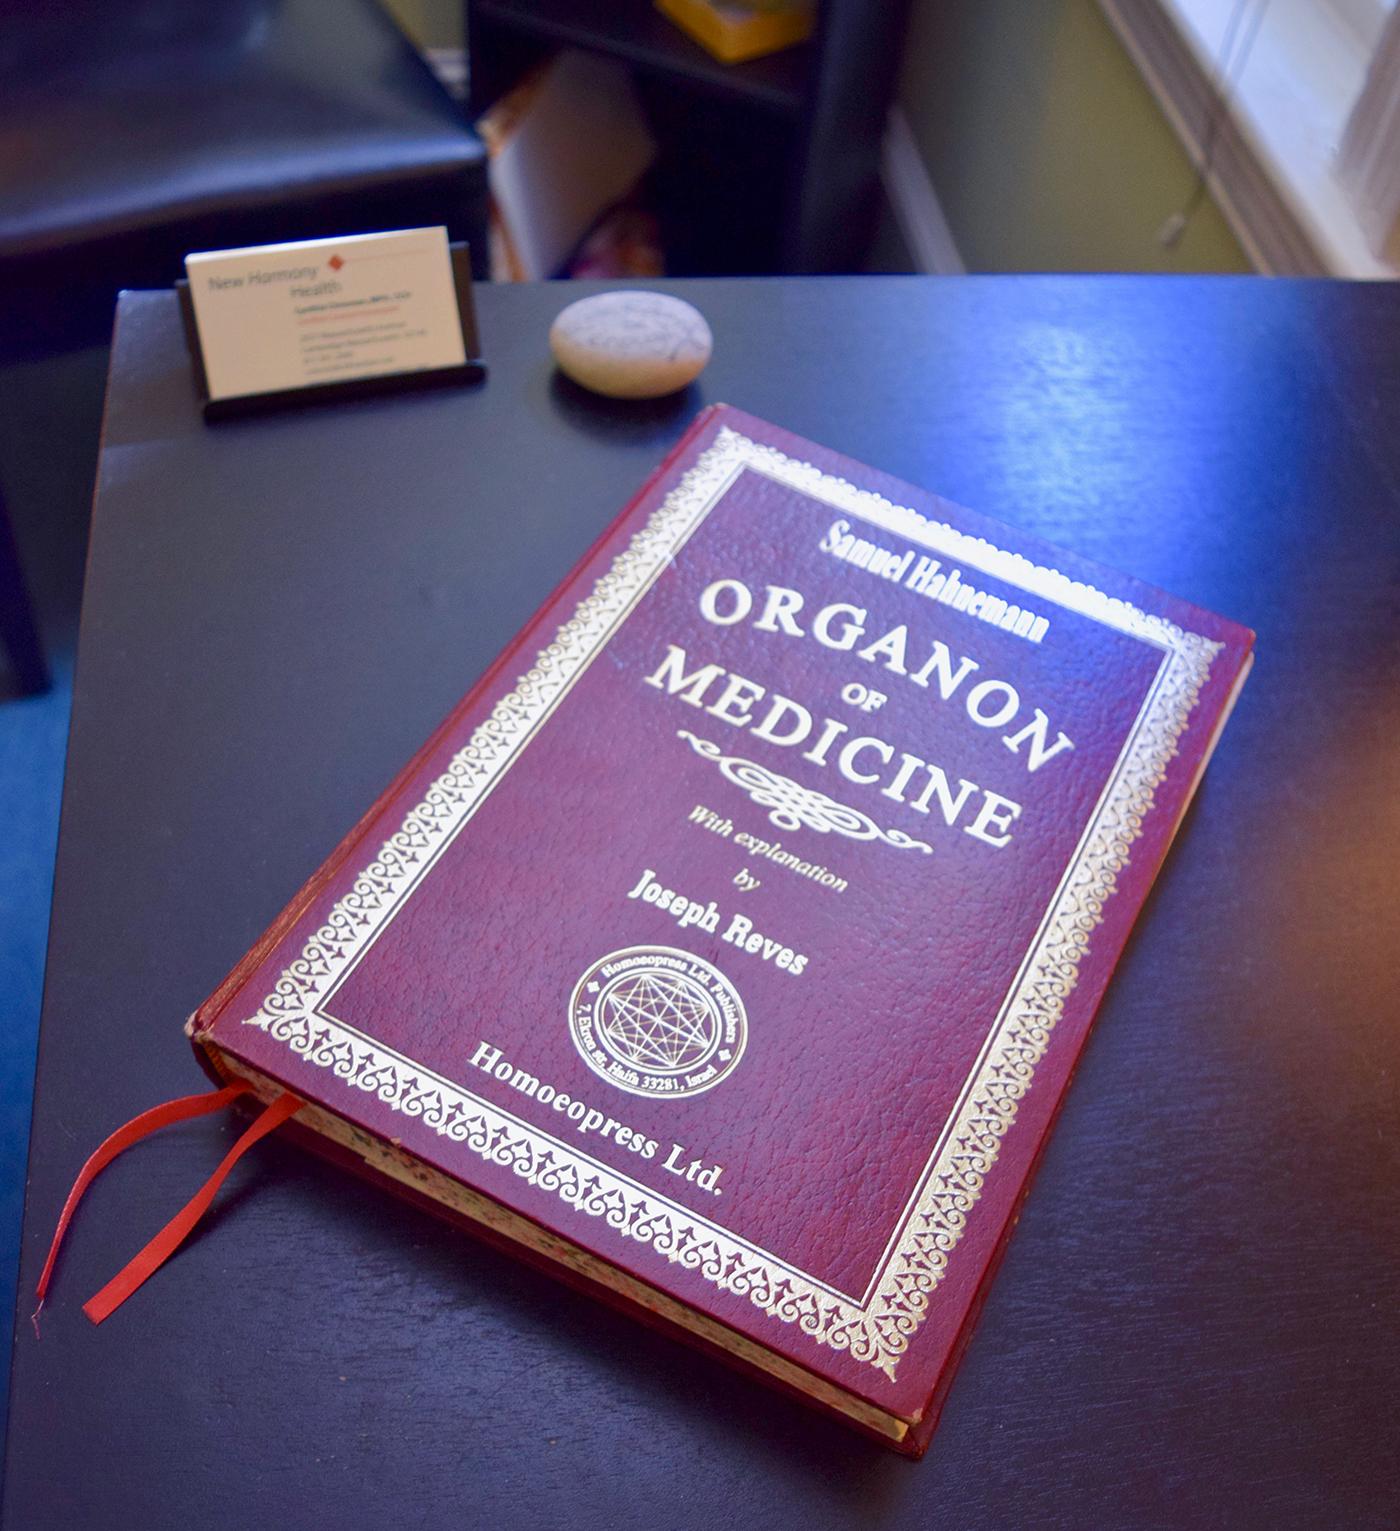 organon-of-medicine